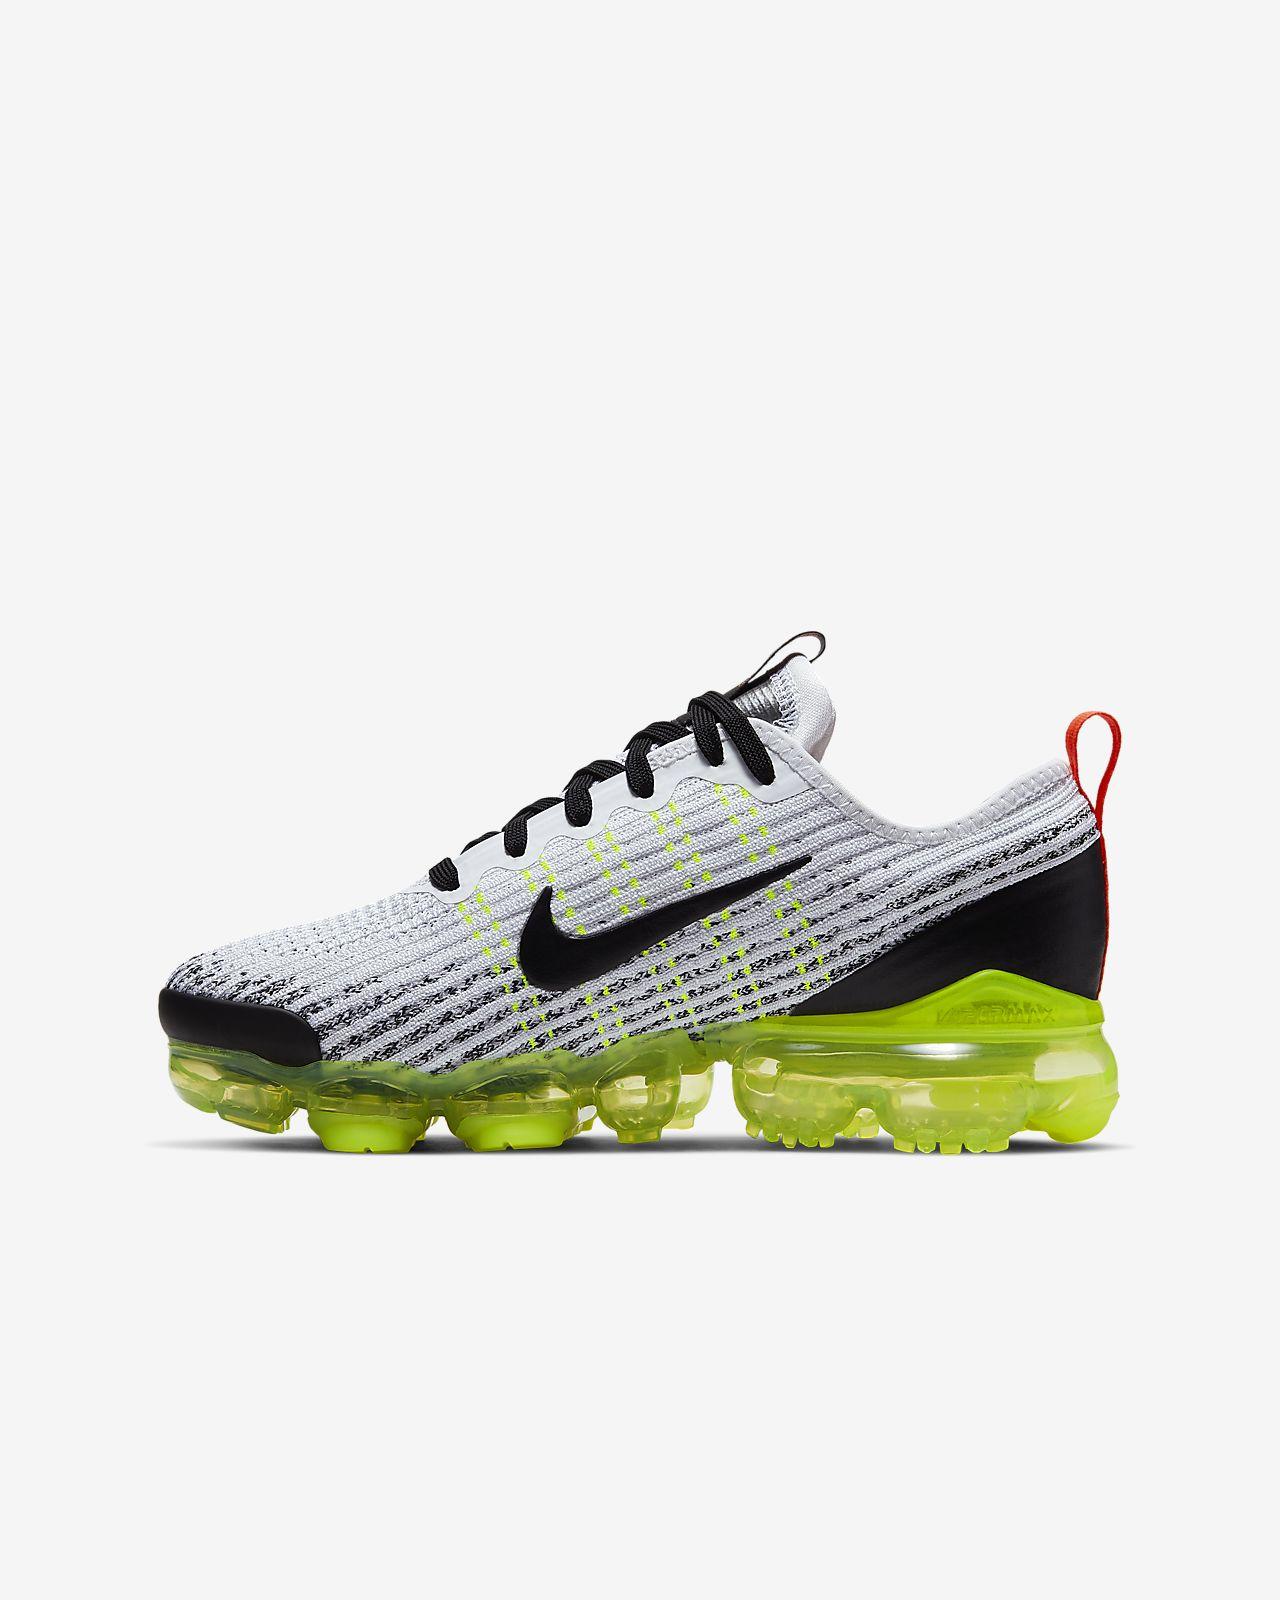 349420b25e7da Scarpa Nike Air VaporMax Flyknit 3 - Ragazzi. Nike.com IT